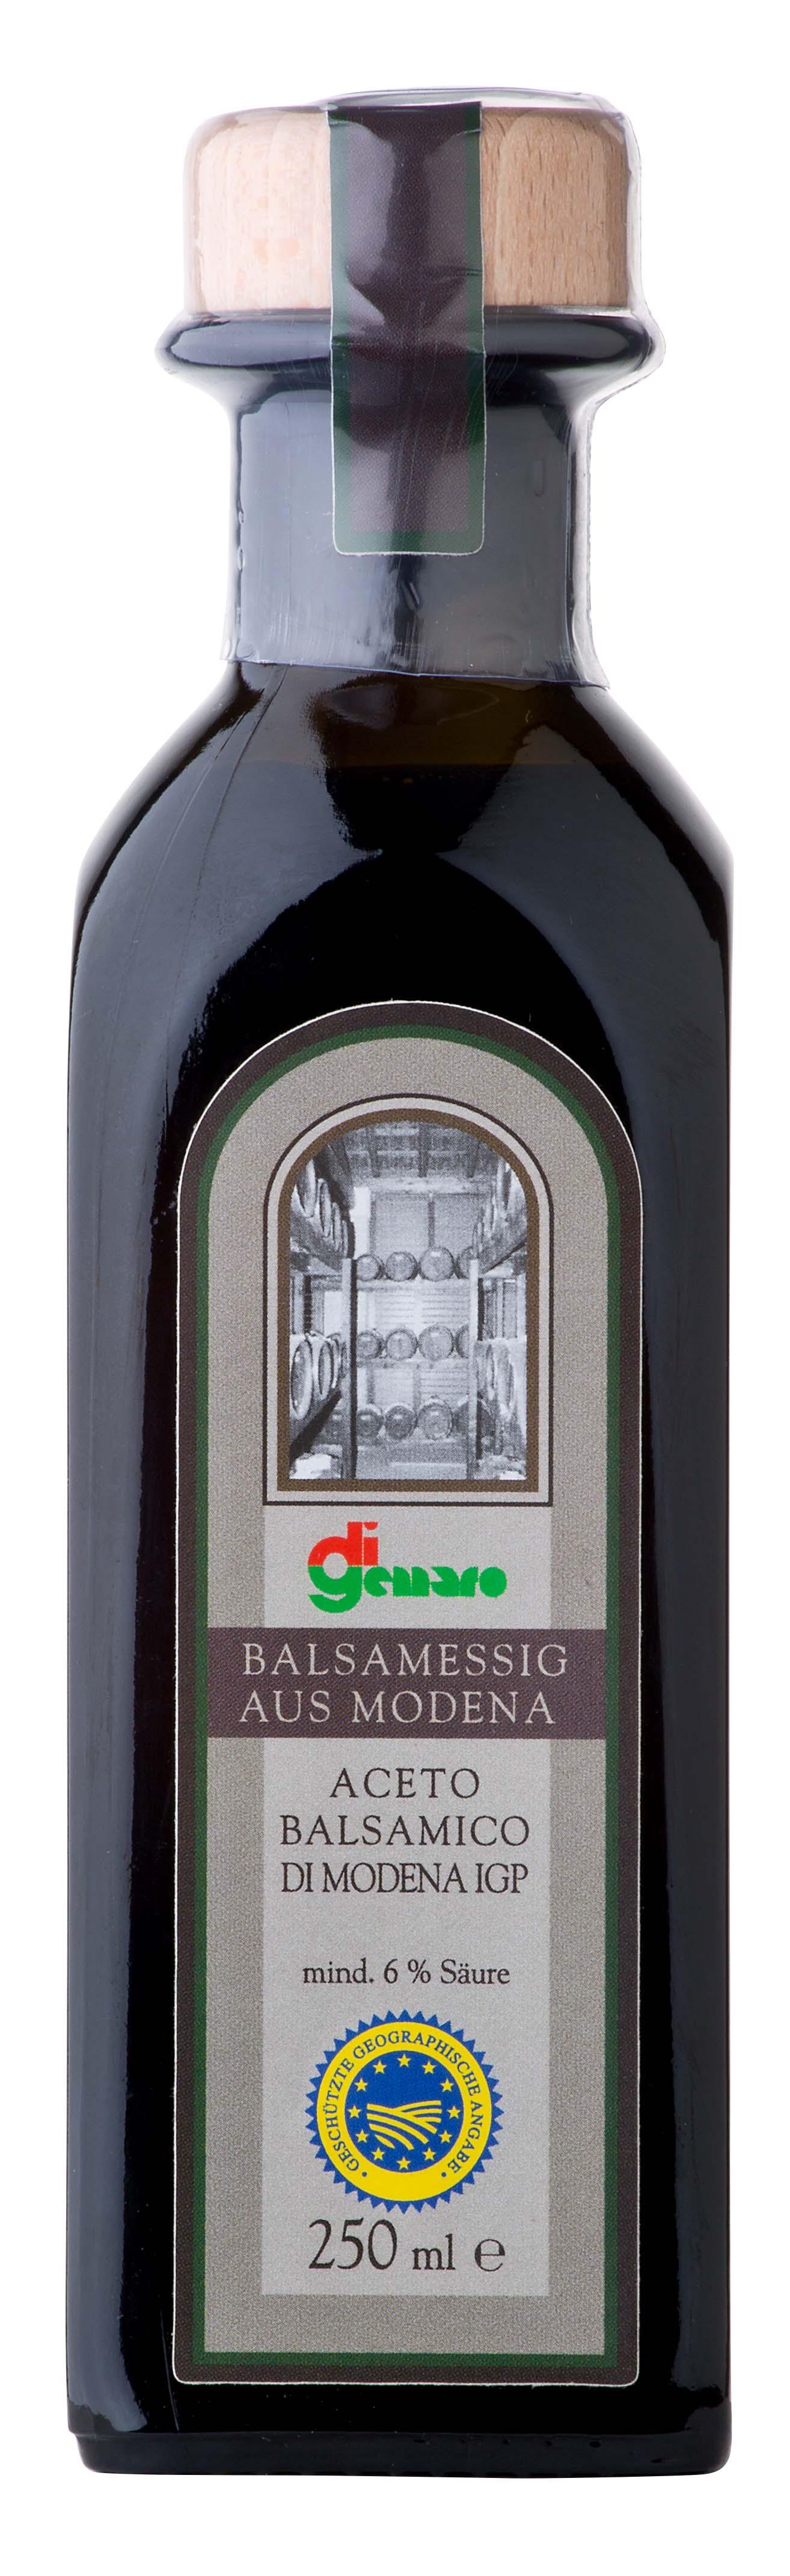 Aceto Balsamico di Modena Sel. Gran Riserva IGP 250 ML DIGE